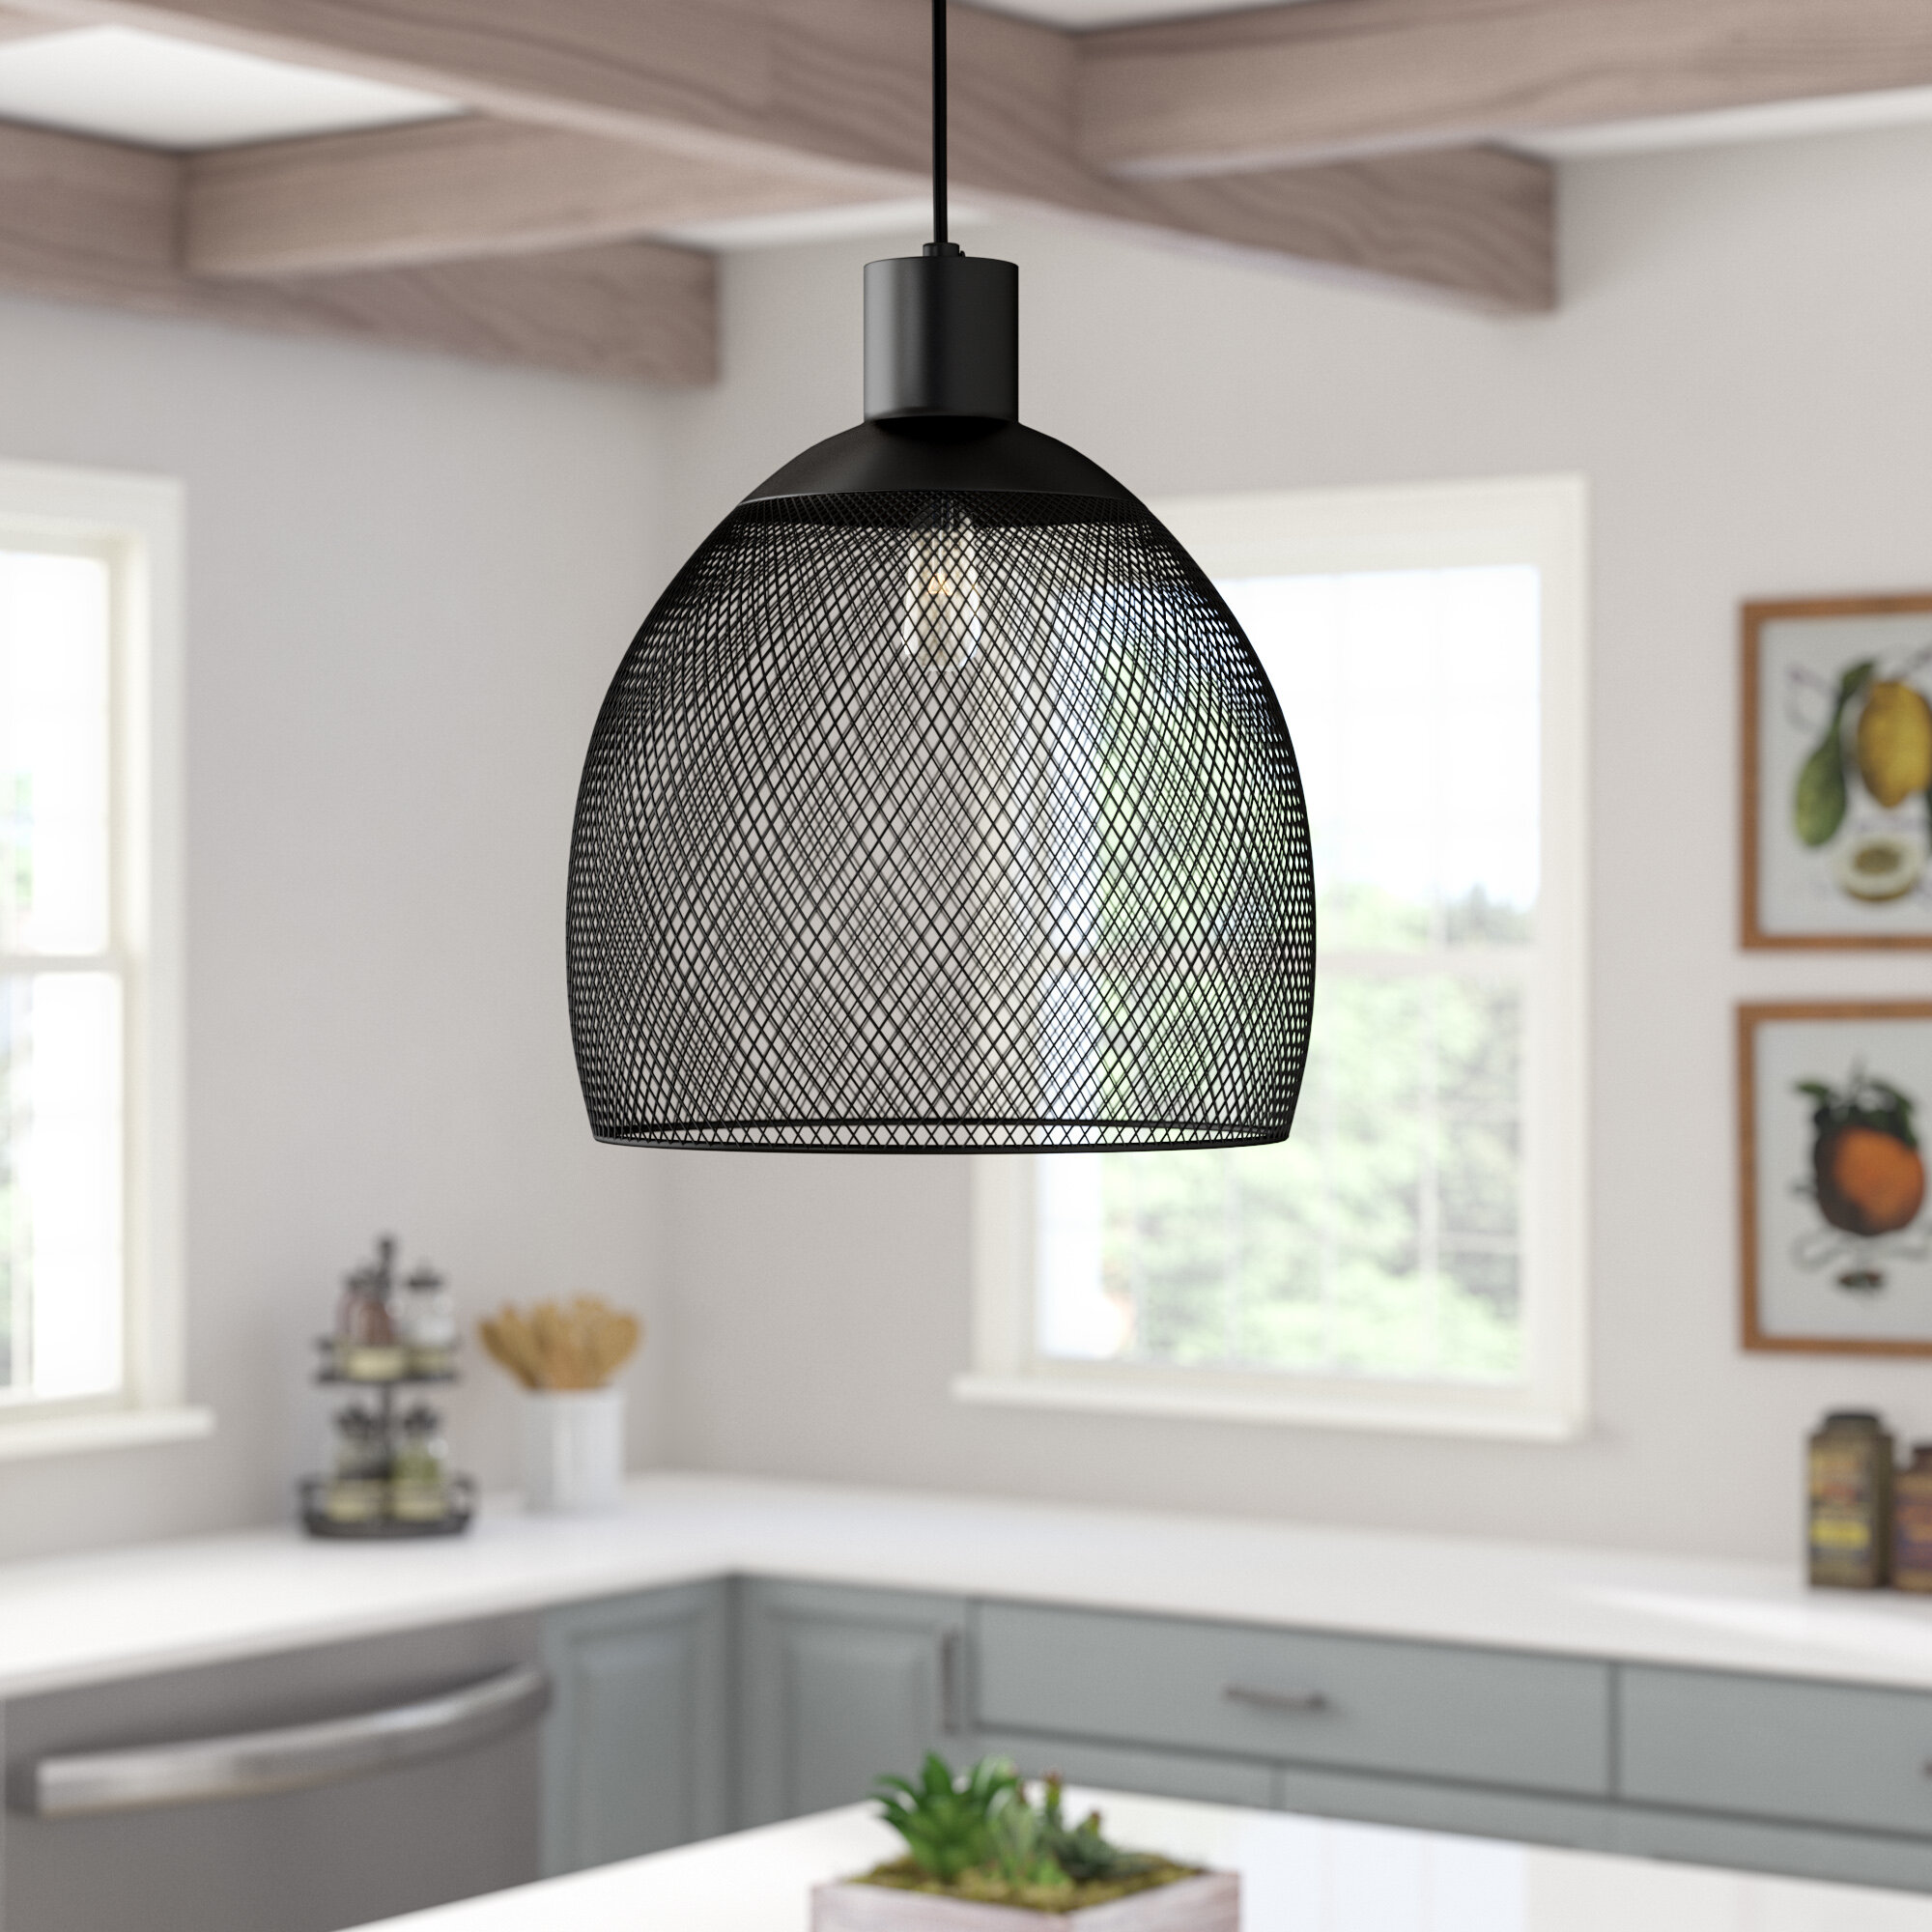 Laurel Foundry Modern Farmhouse Saladino 1 Light Single Dome Pendant Reviews Wayfair